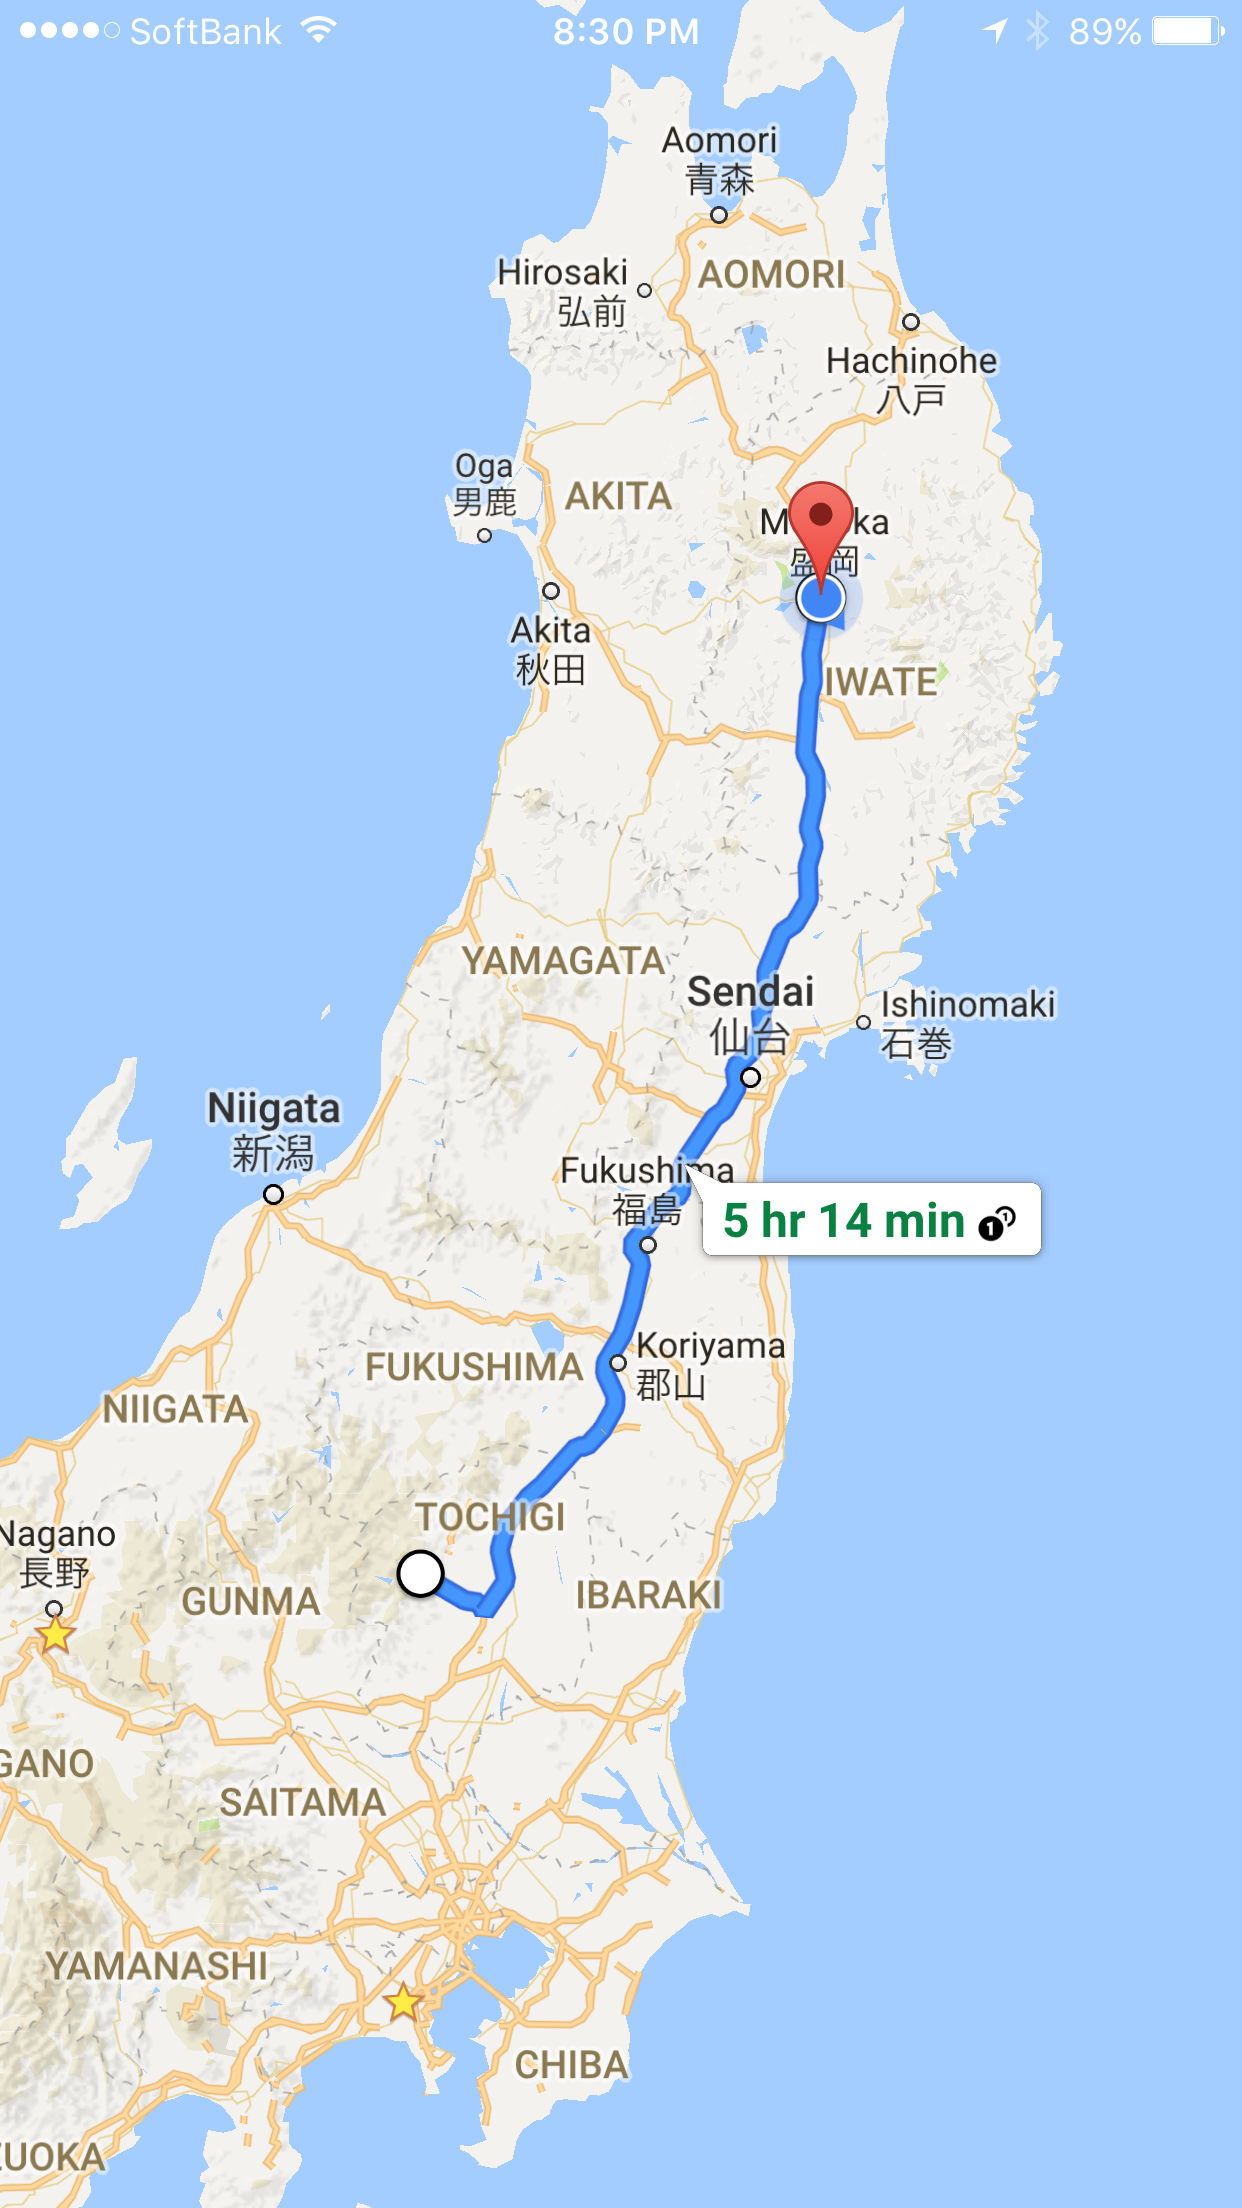 Nikko, Tochigi to Morioka, Iwate, via Sendai, Miyagi: I'm getting Japanese Superchargers 11 and 12 today. 😃